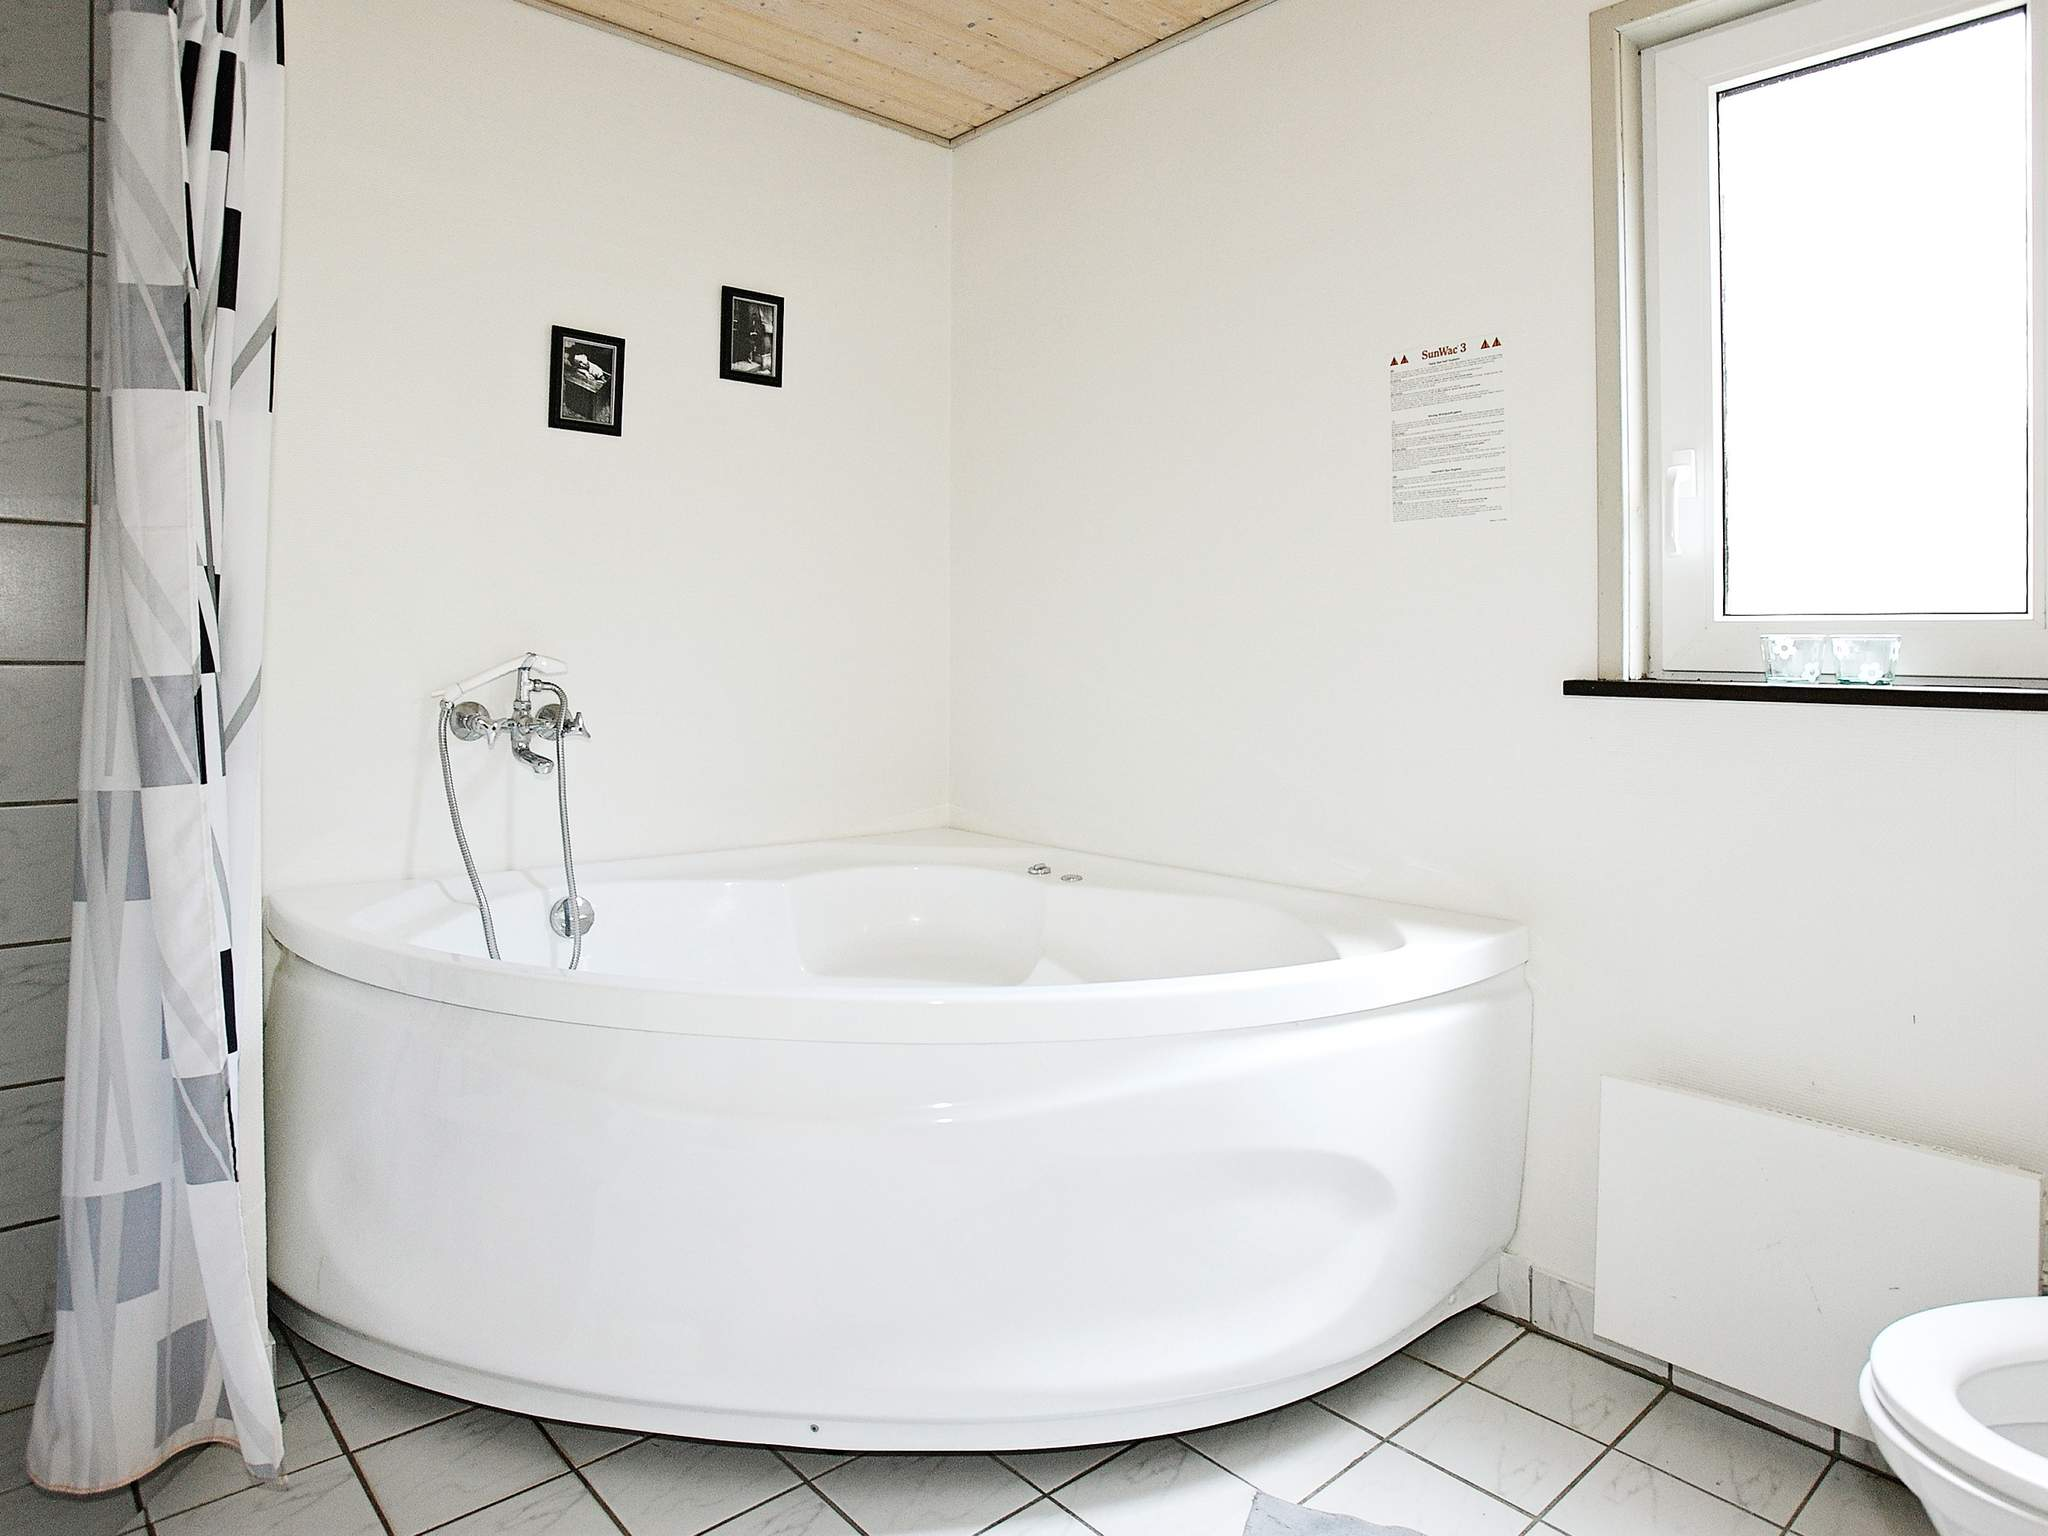 Ferienhaus Øster Hurup (88055), Øster Hurup, , Ostjütland, Dänemark, Bild 18